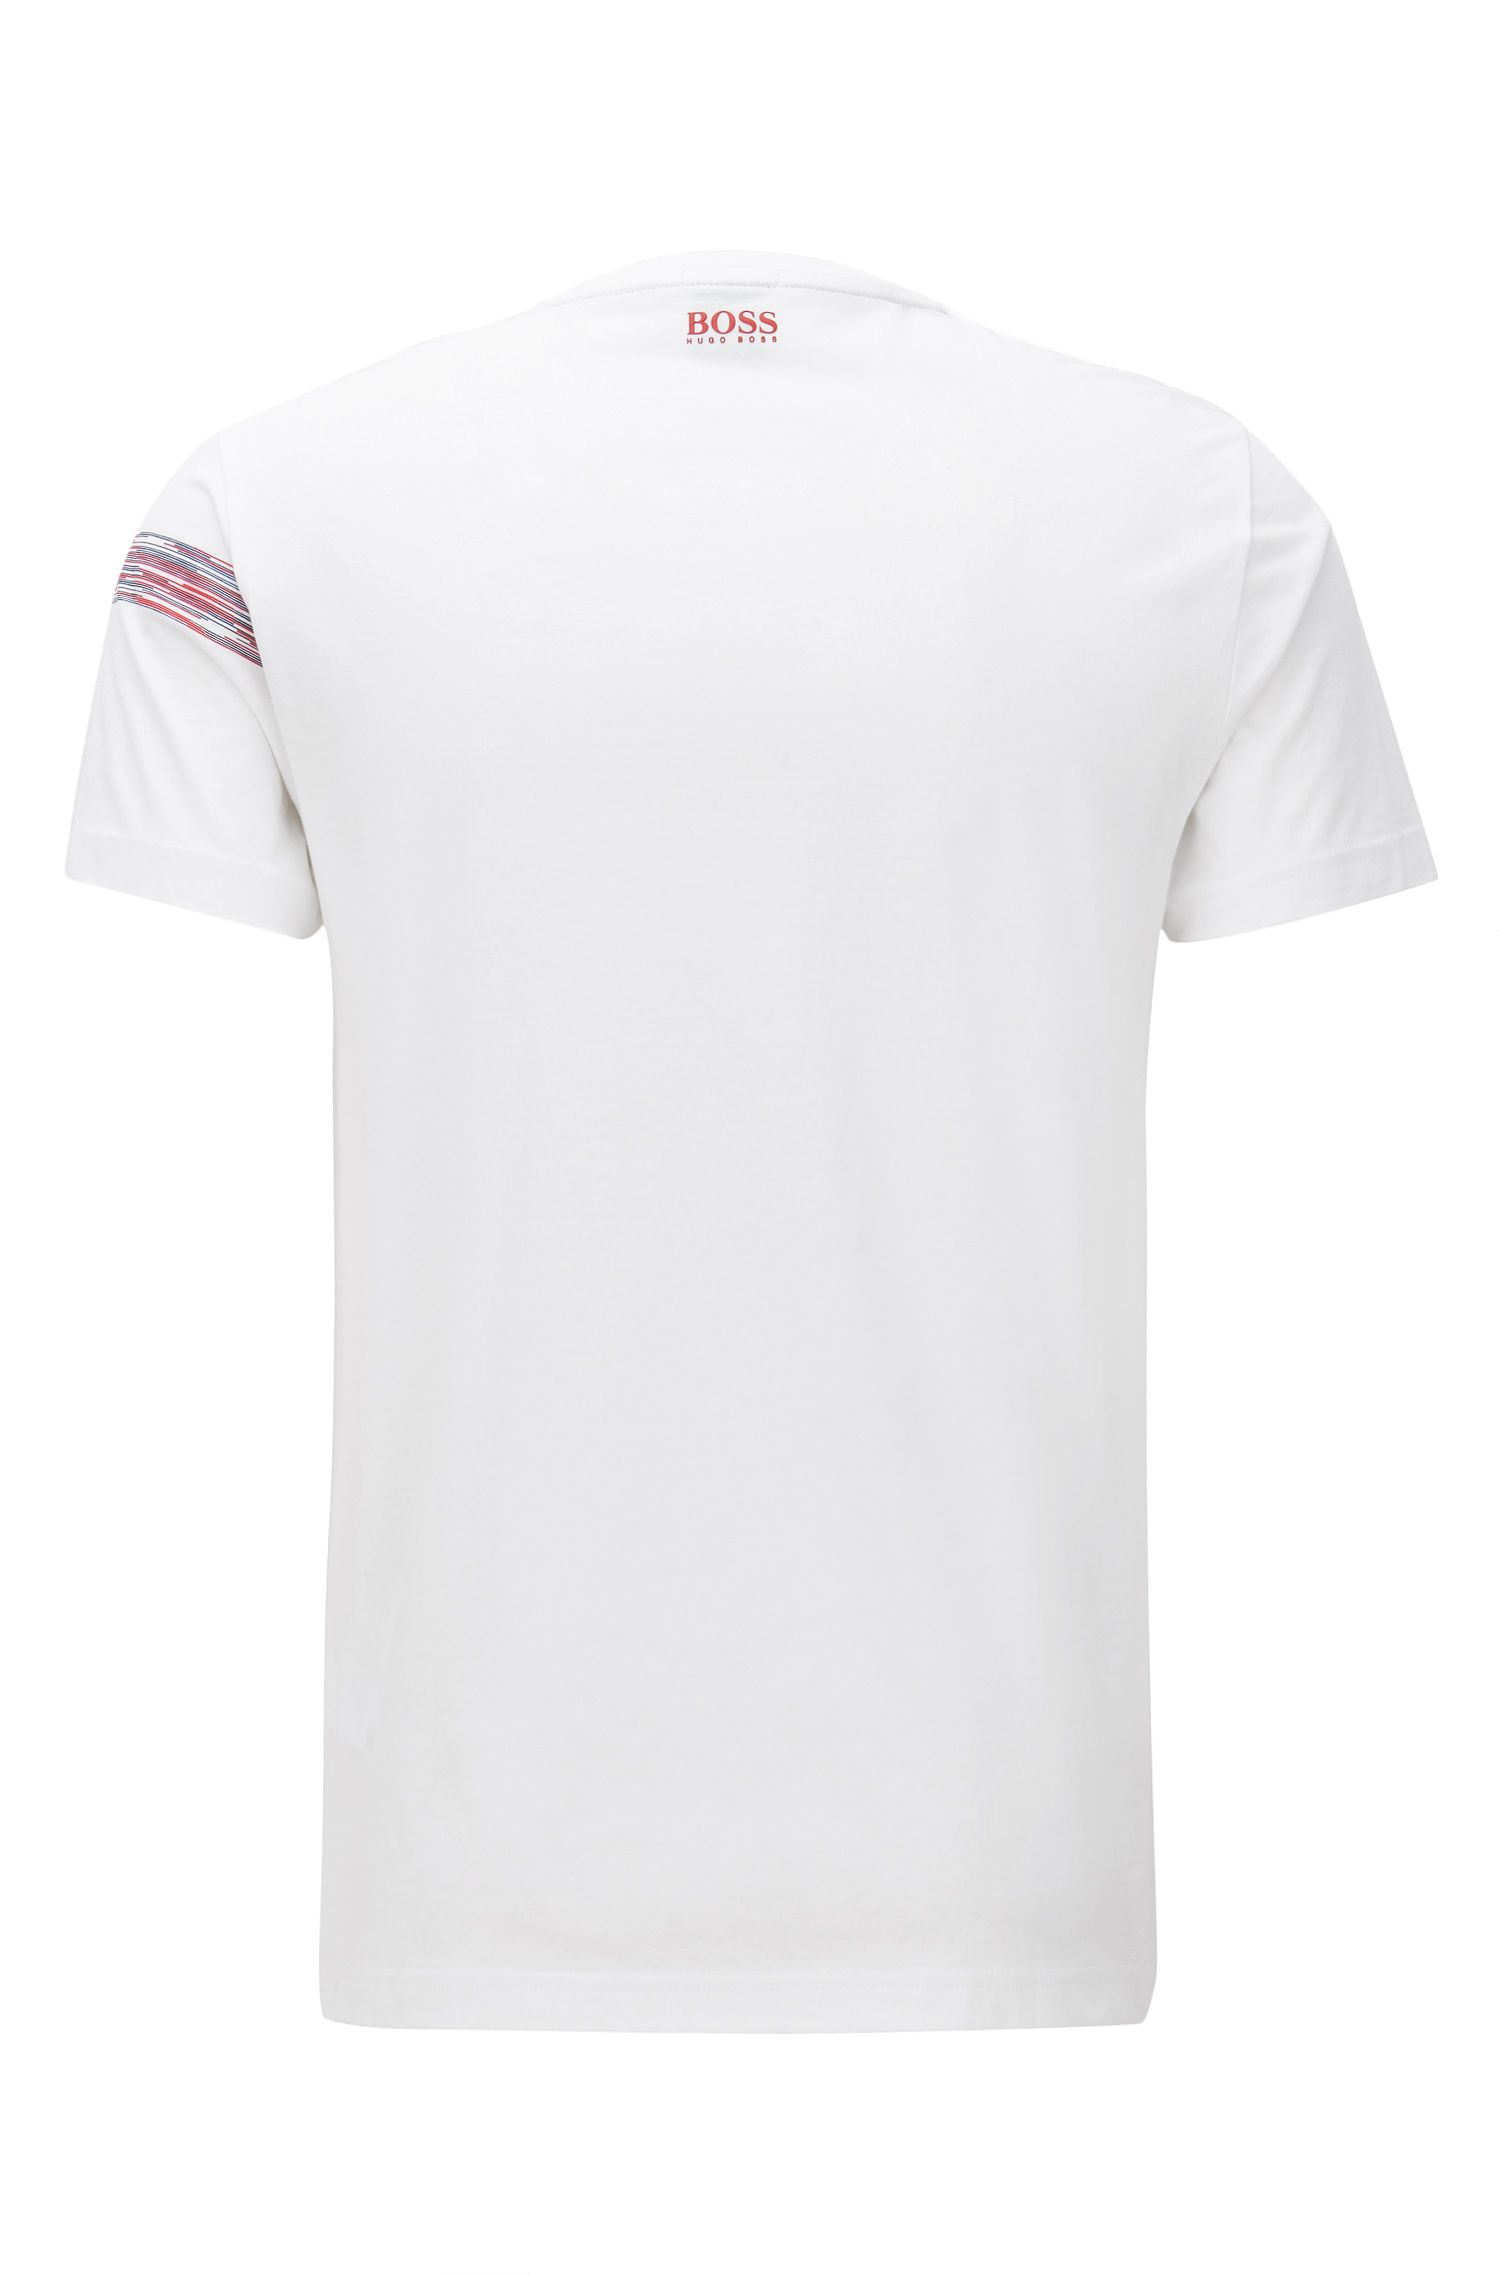 Graphic T-Shirt | Teep